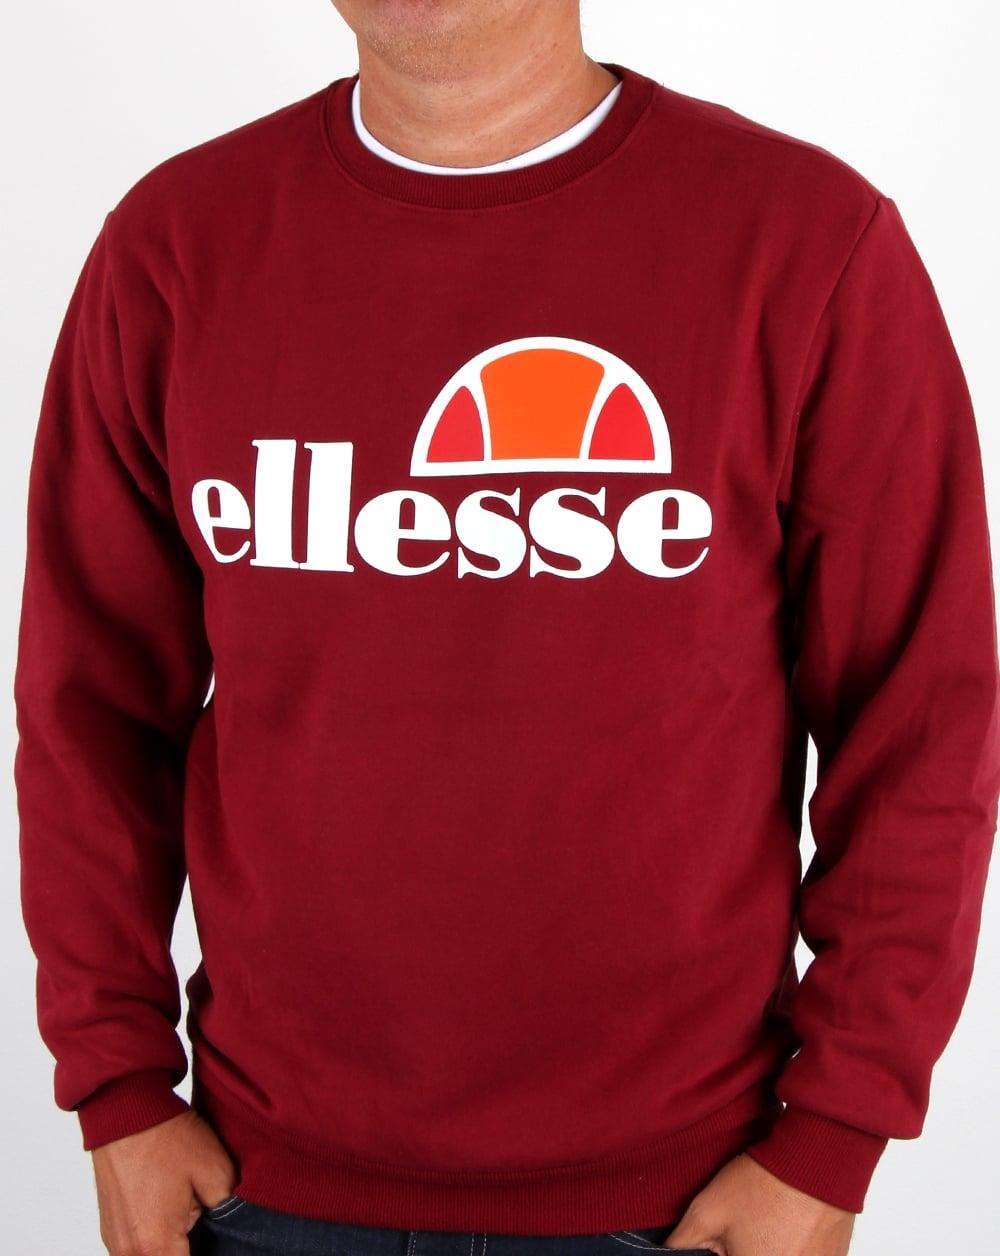 ba1aa464fa Ellesse Succiso Sweatshirt Tibetan Red